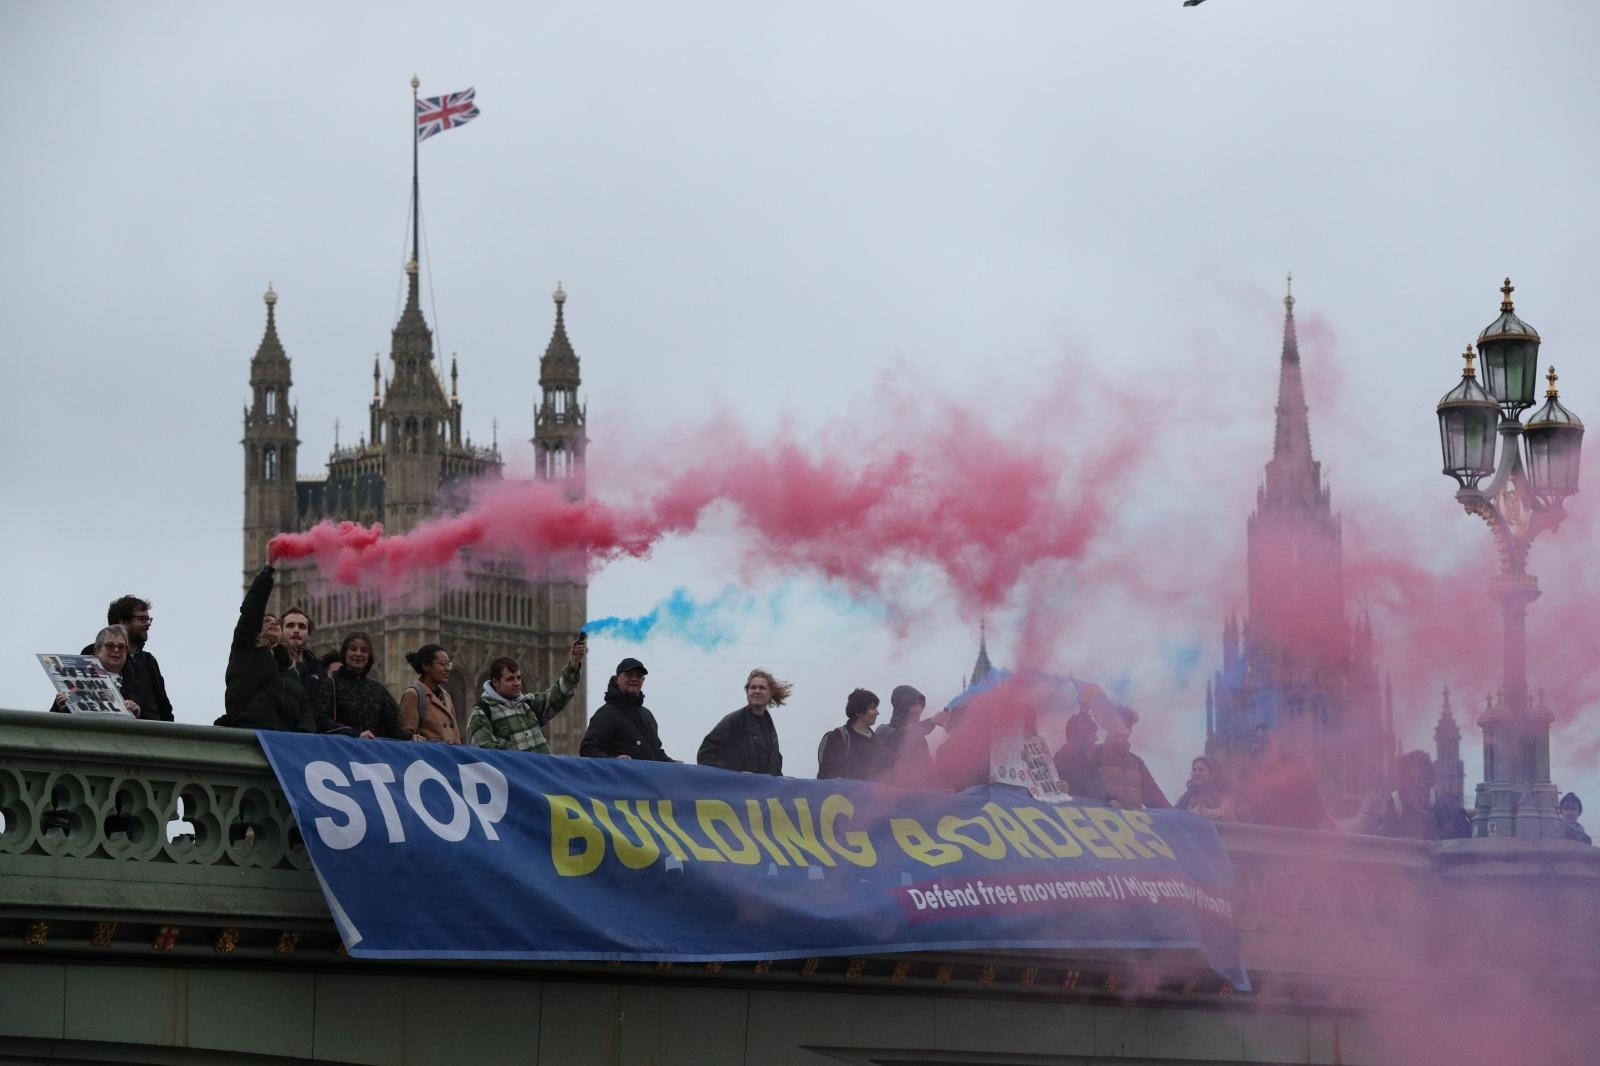 Protesti proti brexitu - London Vir:Pixell